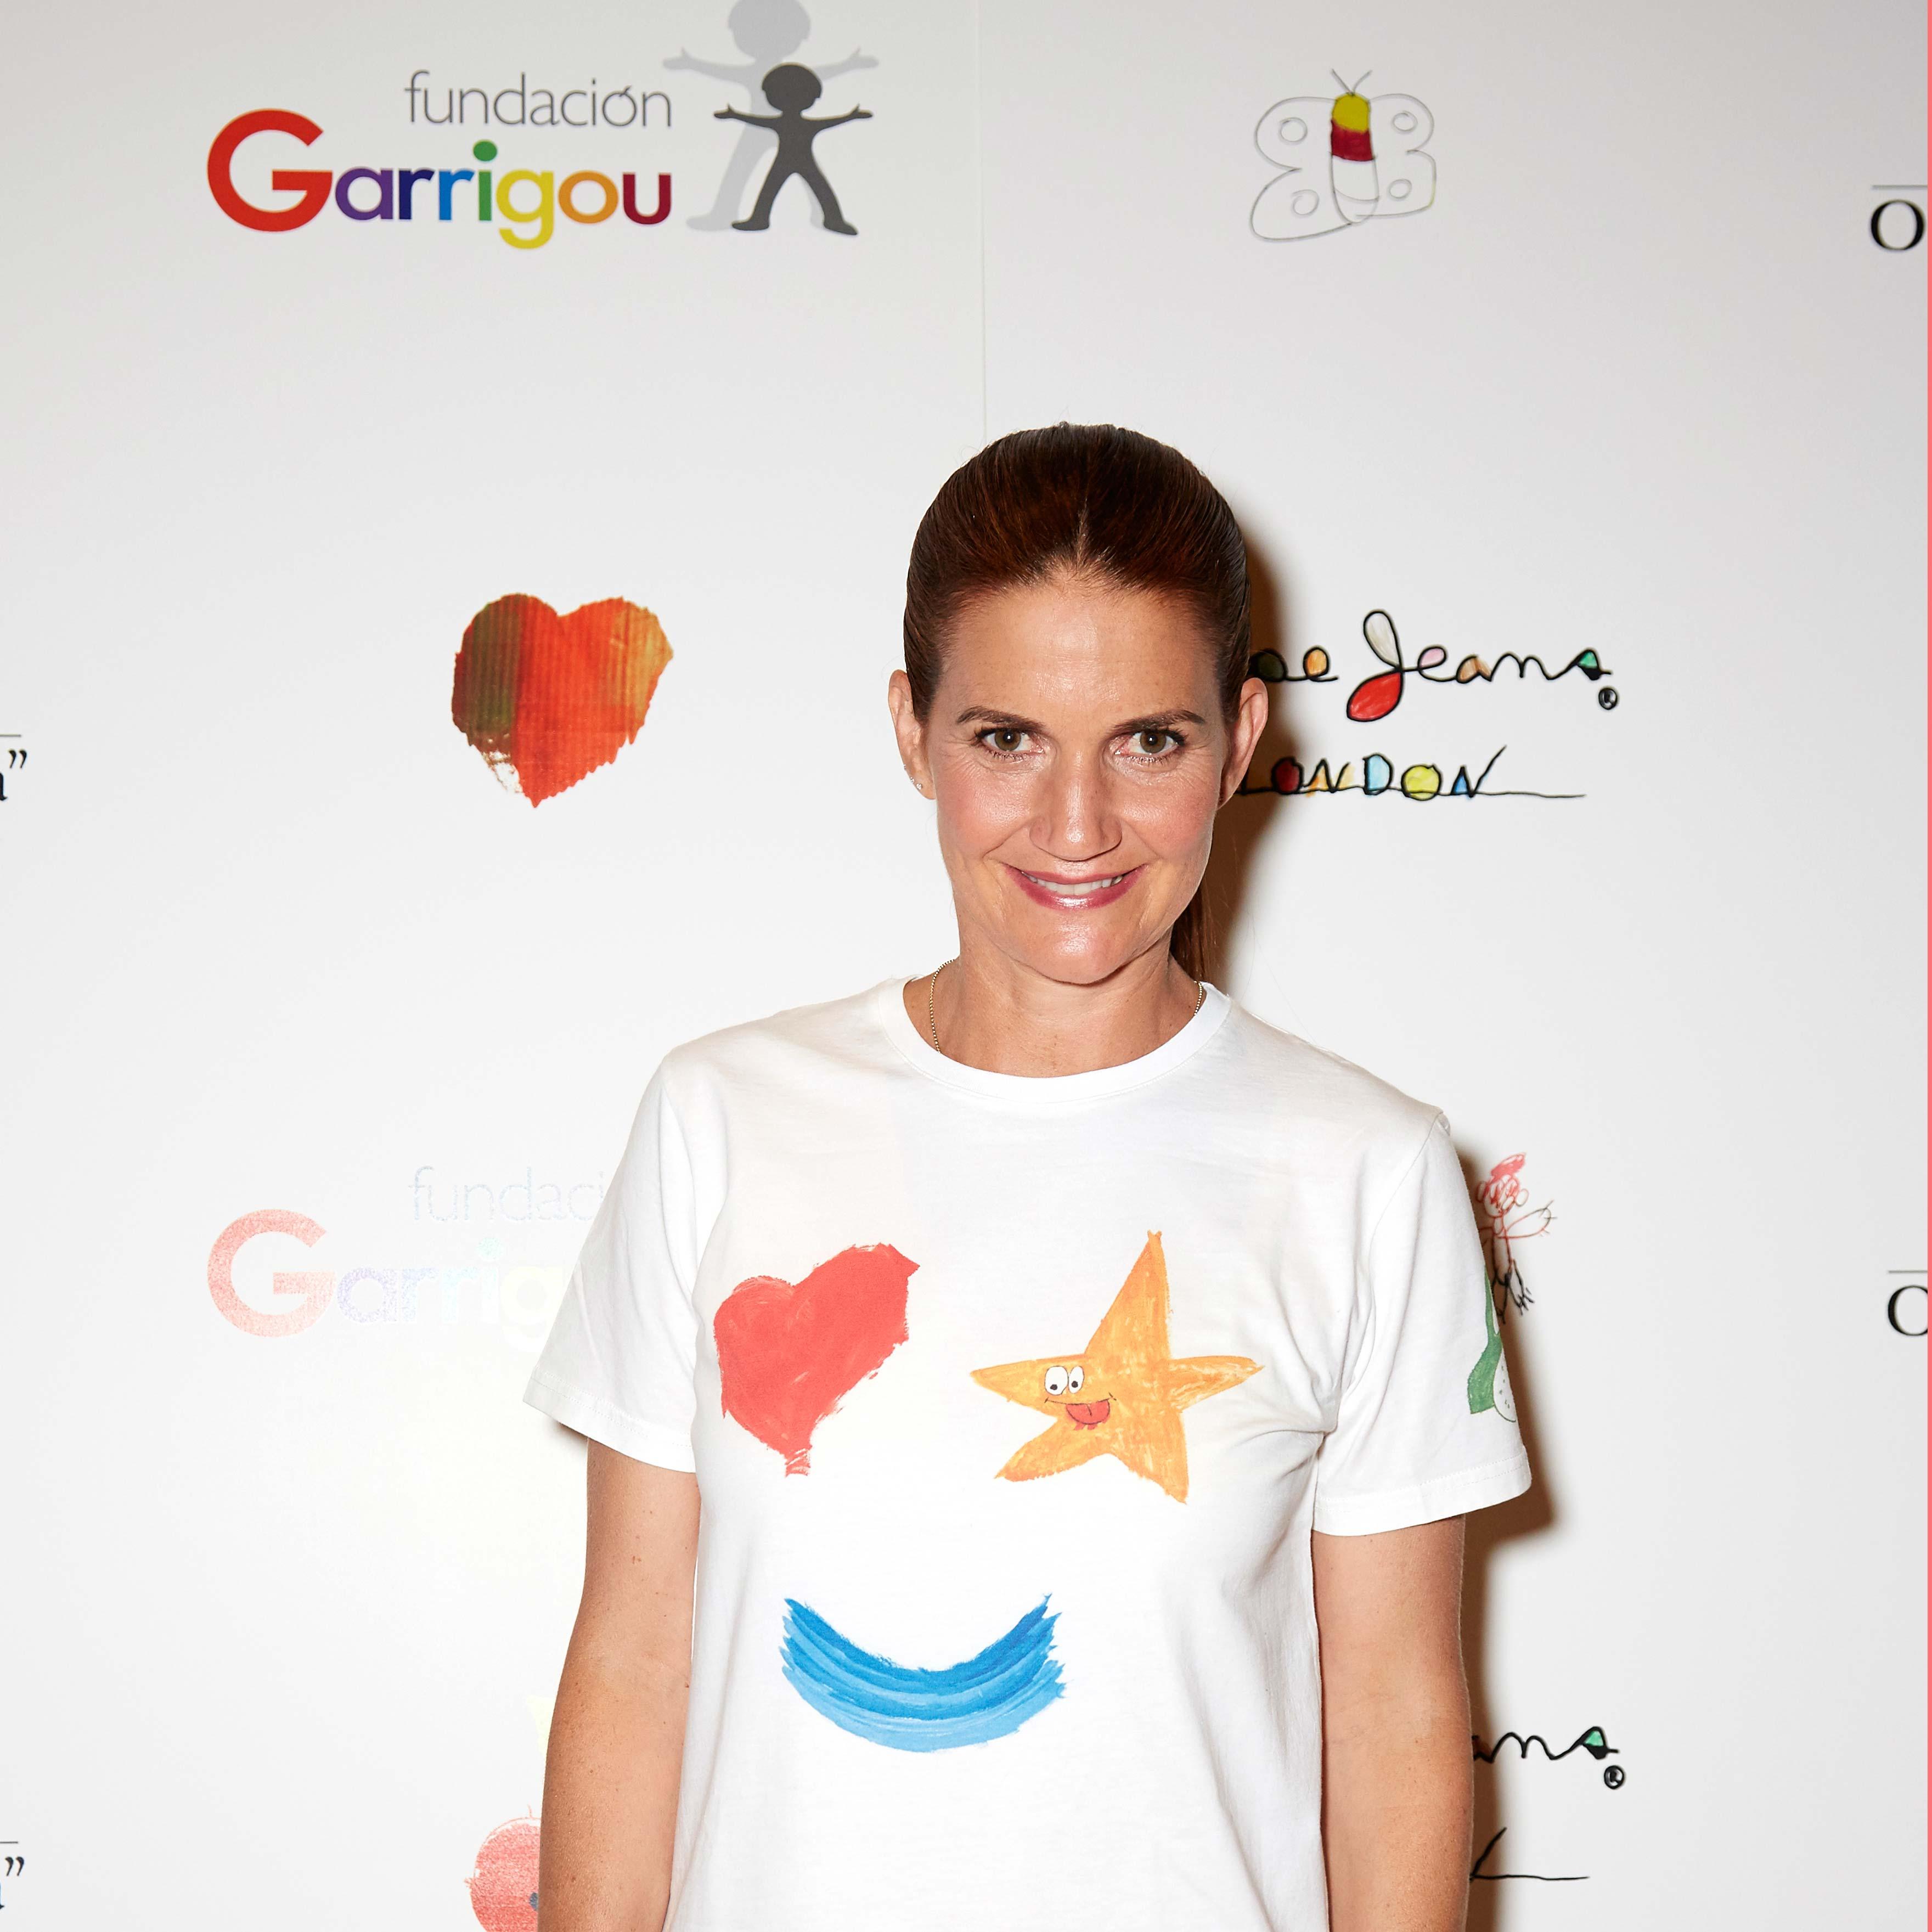 camiseta_solidaria_garrigou_sindromedown